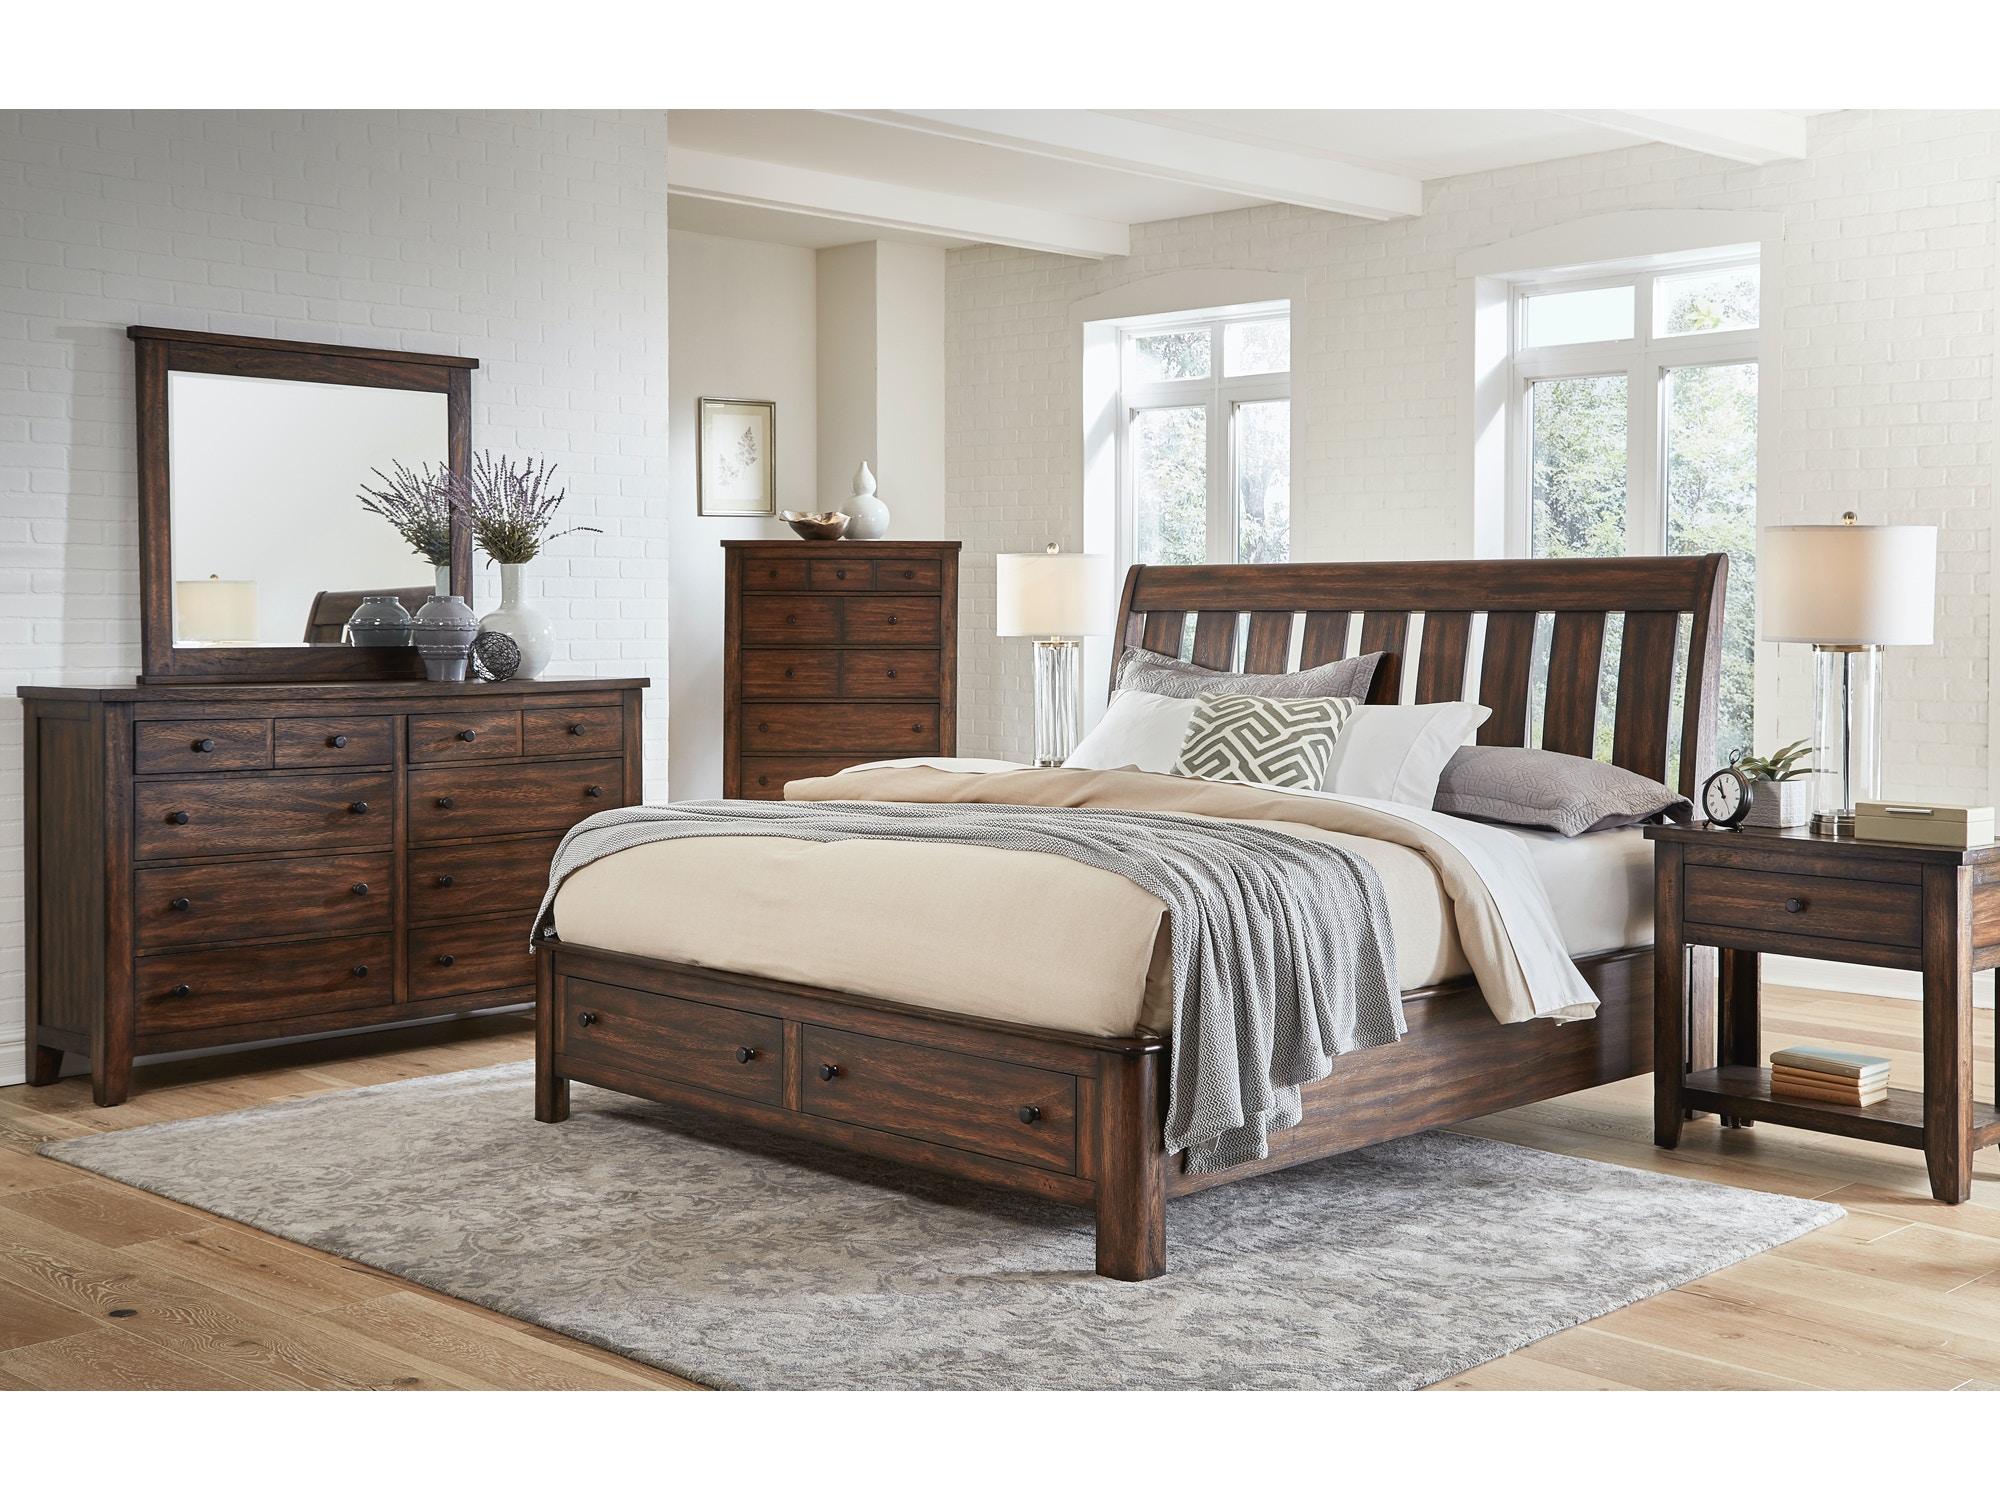 Pitman Fry Master Bedroom Sets - Furniture Fair - Cincinnati ...